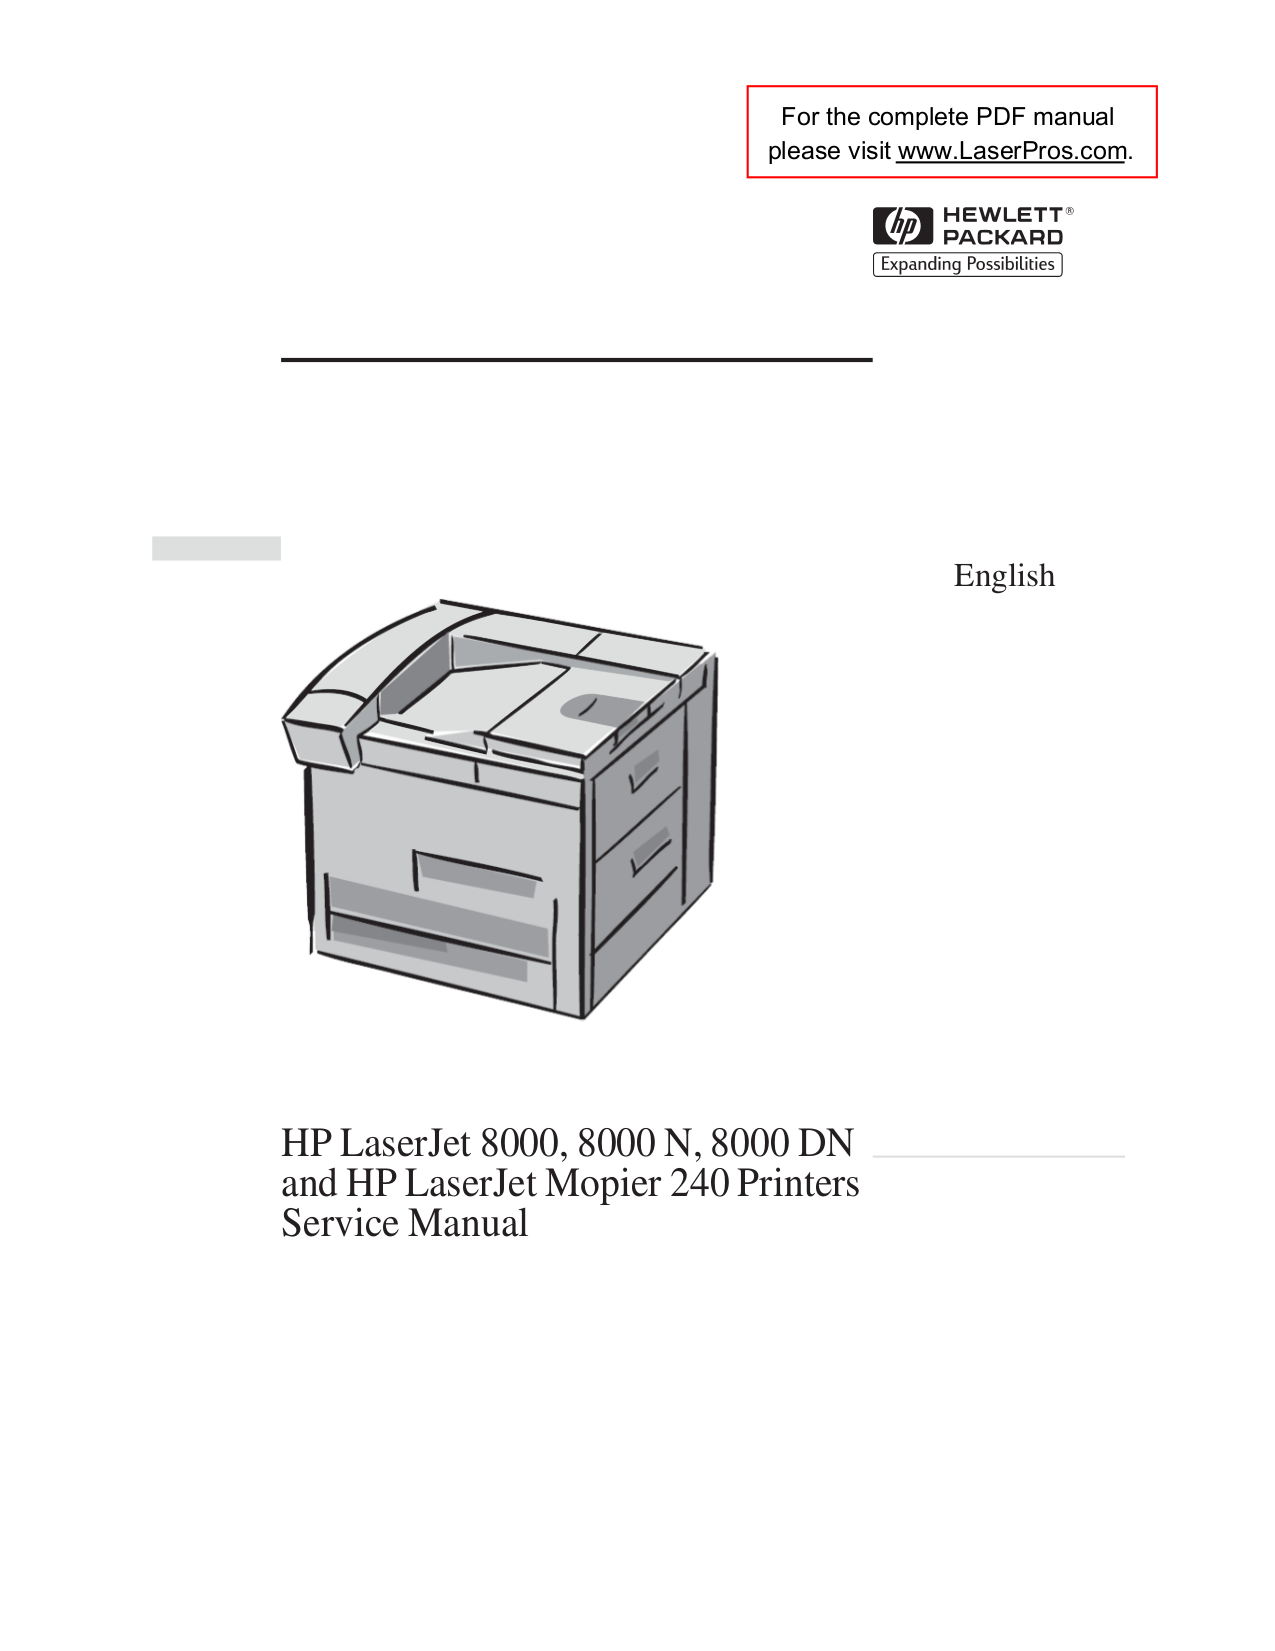 Hewlett Packard Printer Repair Manuals Ebook Hp Laserjet 1100a Service Manual Pro M1212nf Multifunction User Array Download Free Pdf For Mopier 240 Rh Umlib Com